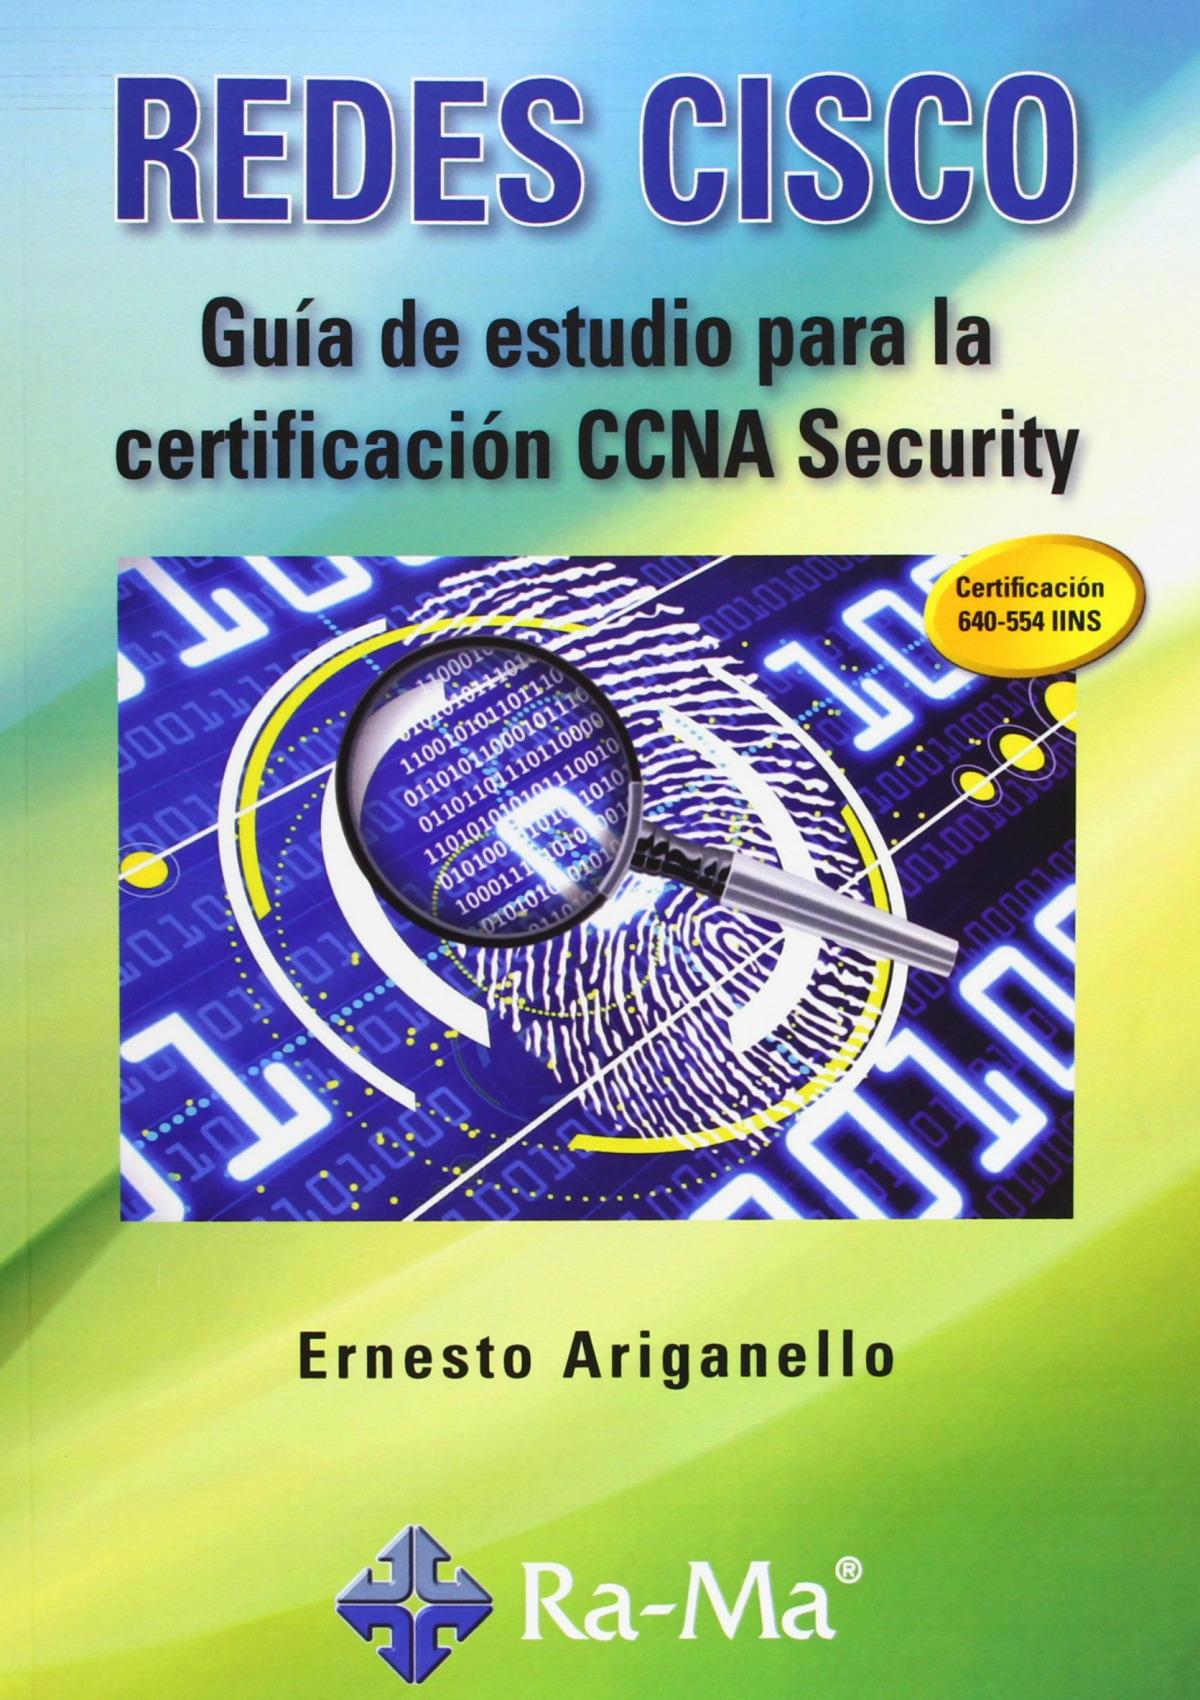 GUIA ESTUDIO CERTIF.CCNA SECURITY.(REDES CISCO) 9788499642147